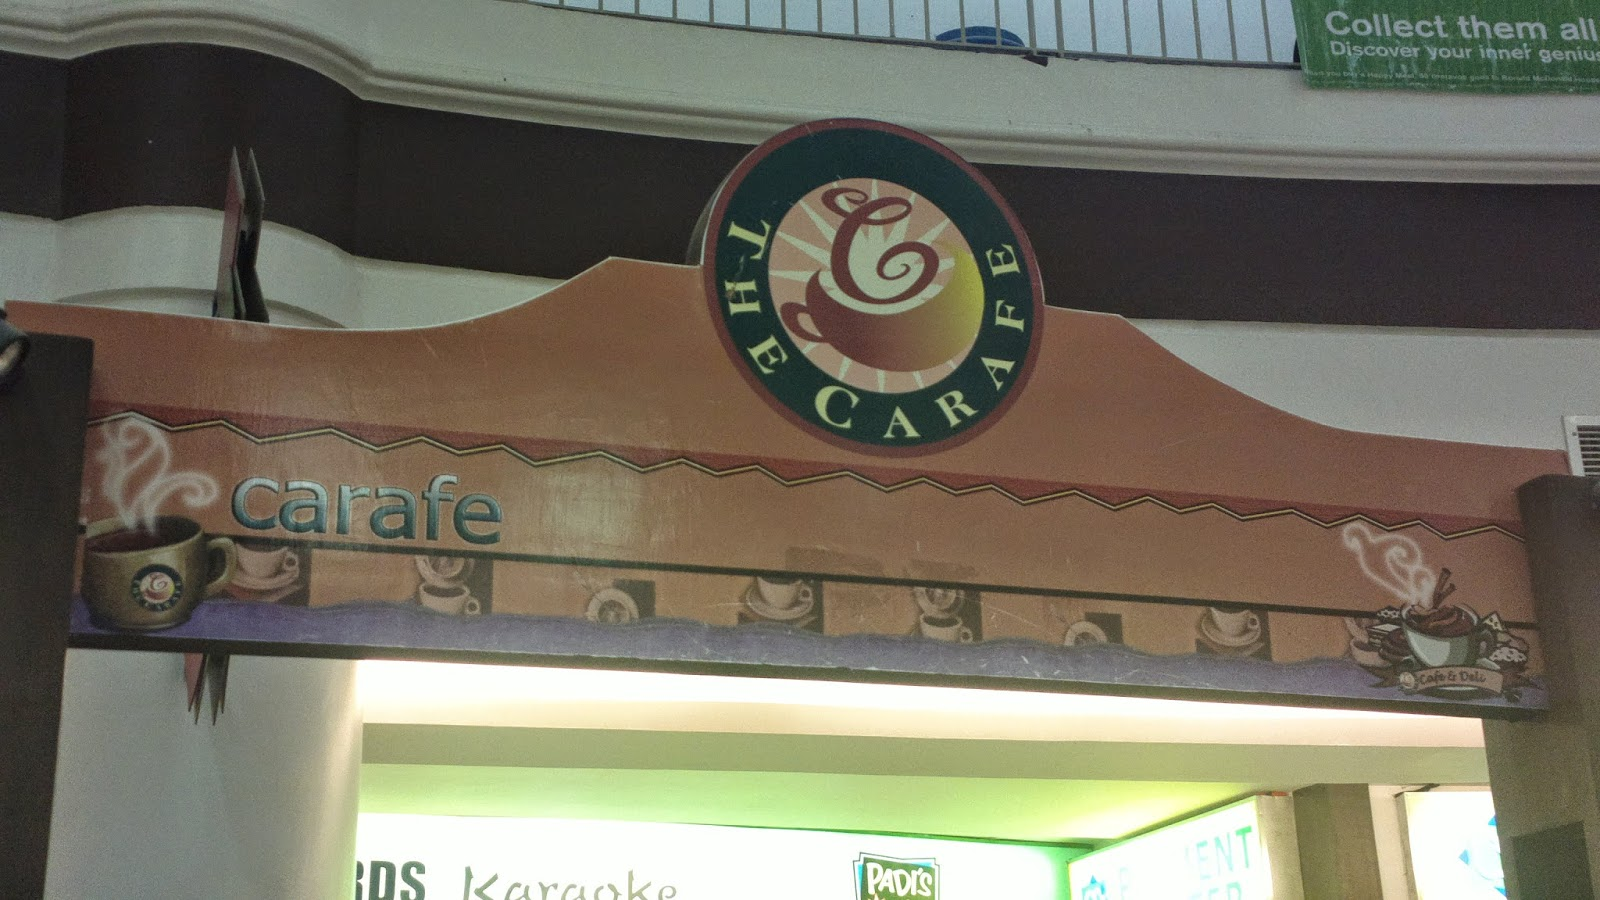 The Carafe at CSI City Mall Dagupan